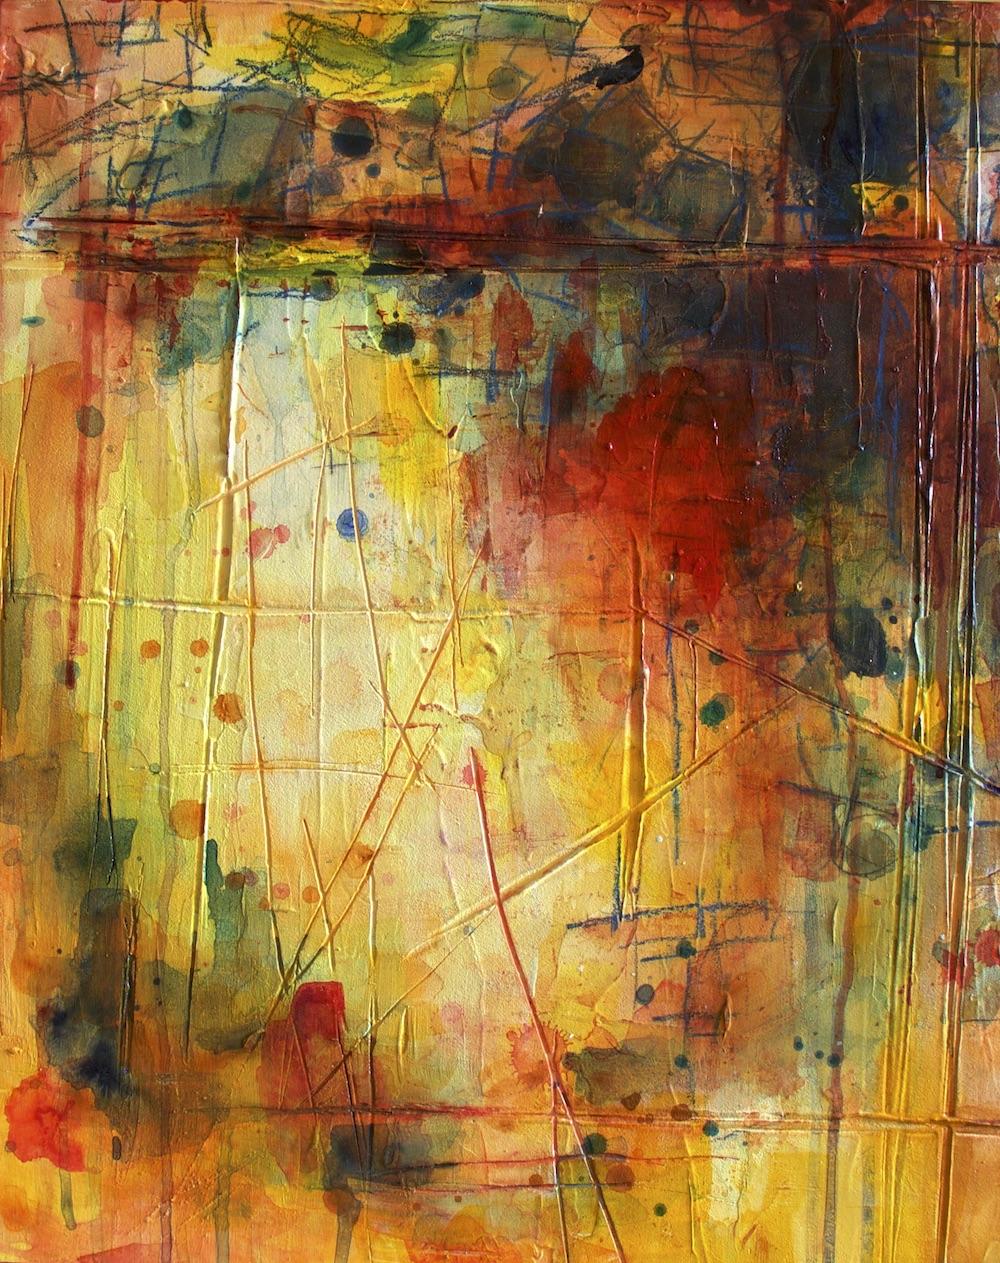 Beth Stewart - 3 - Aesthetics of Morality.jpg